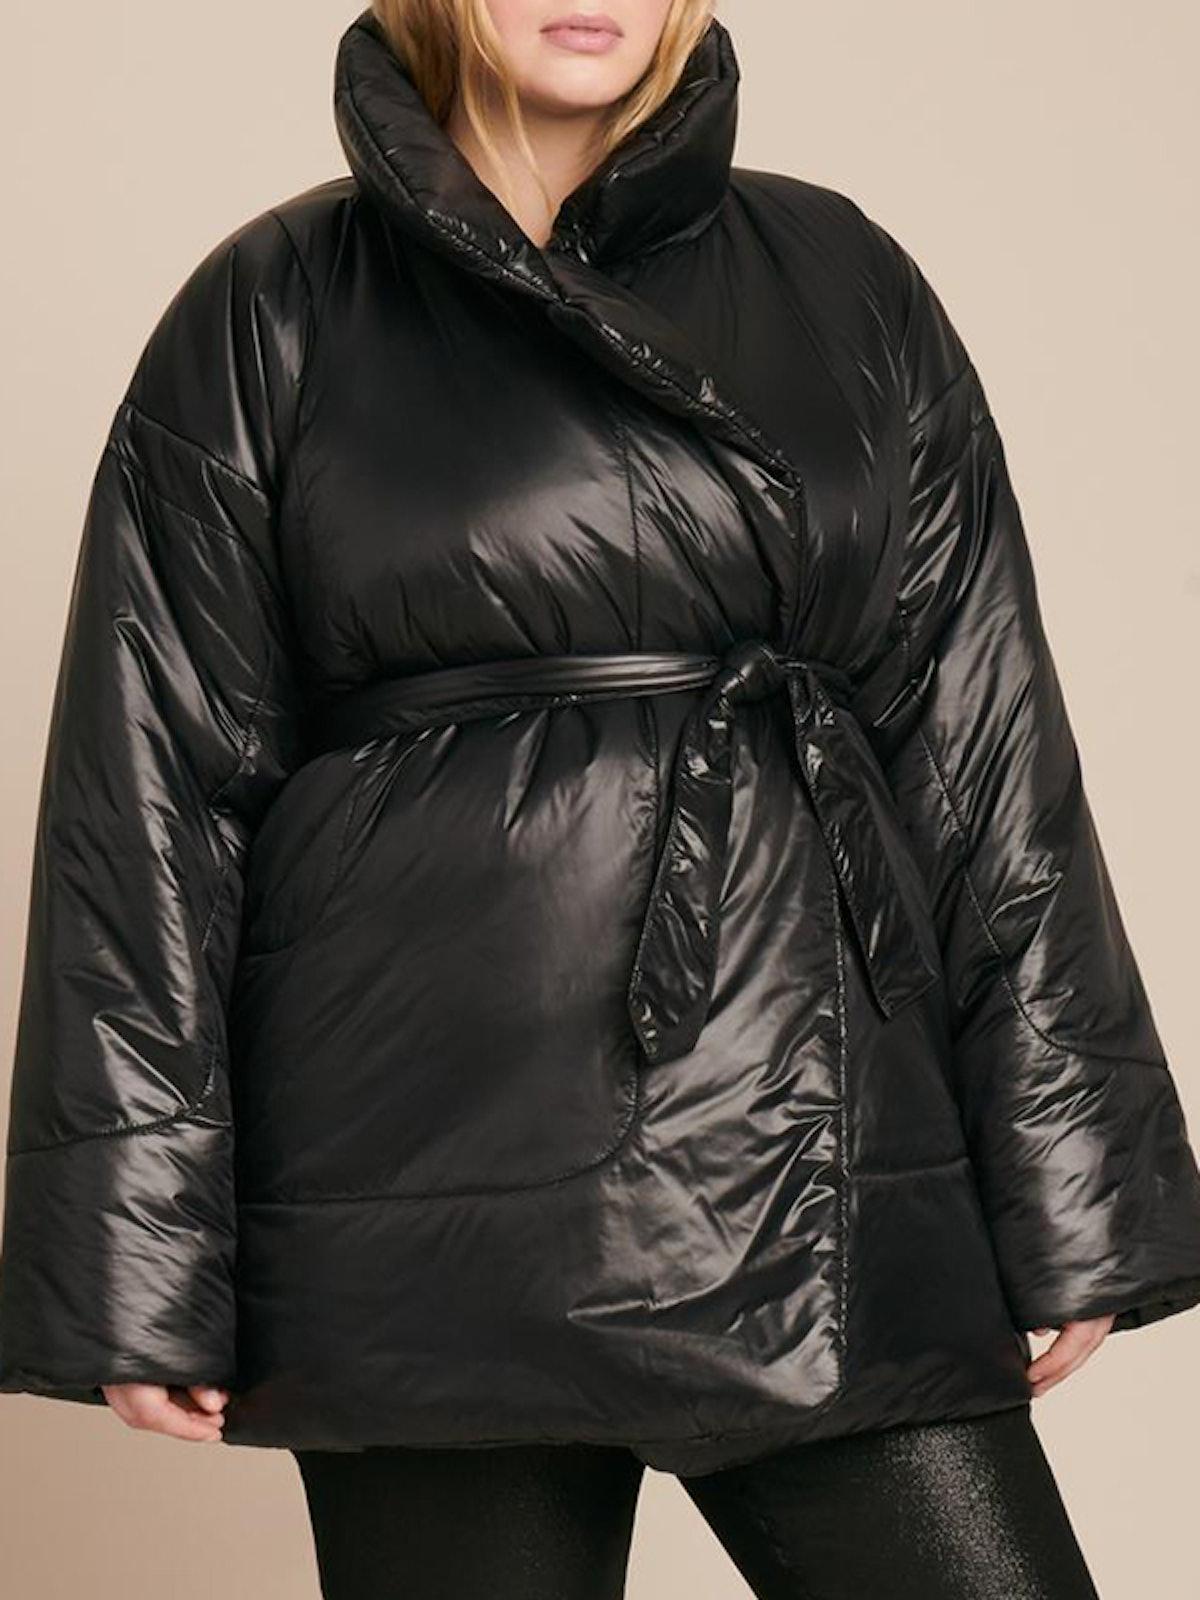 Sleeping Bag Car Coat